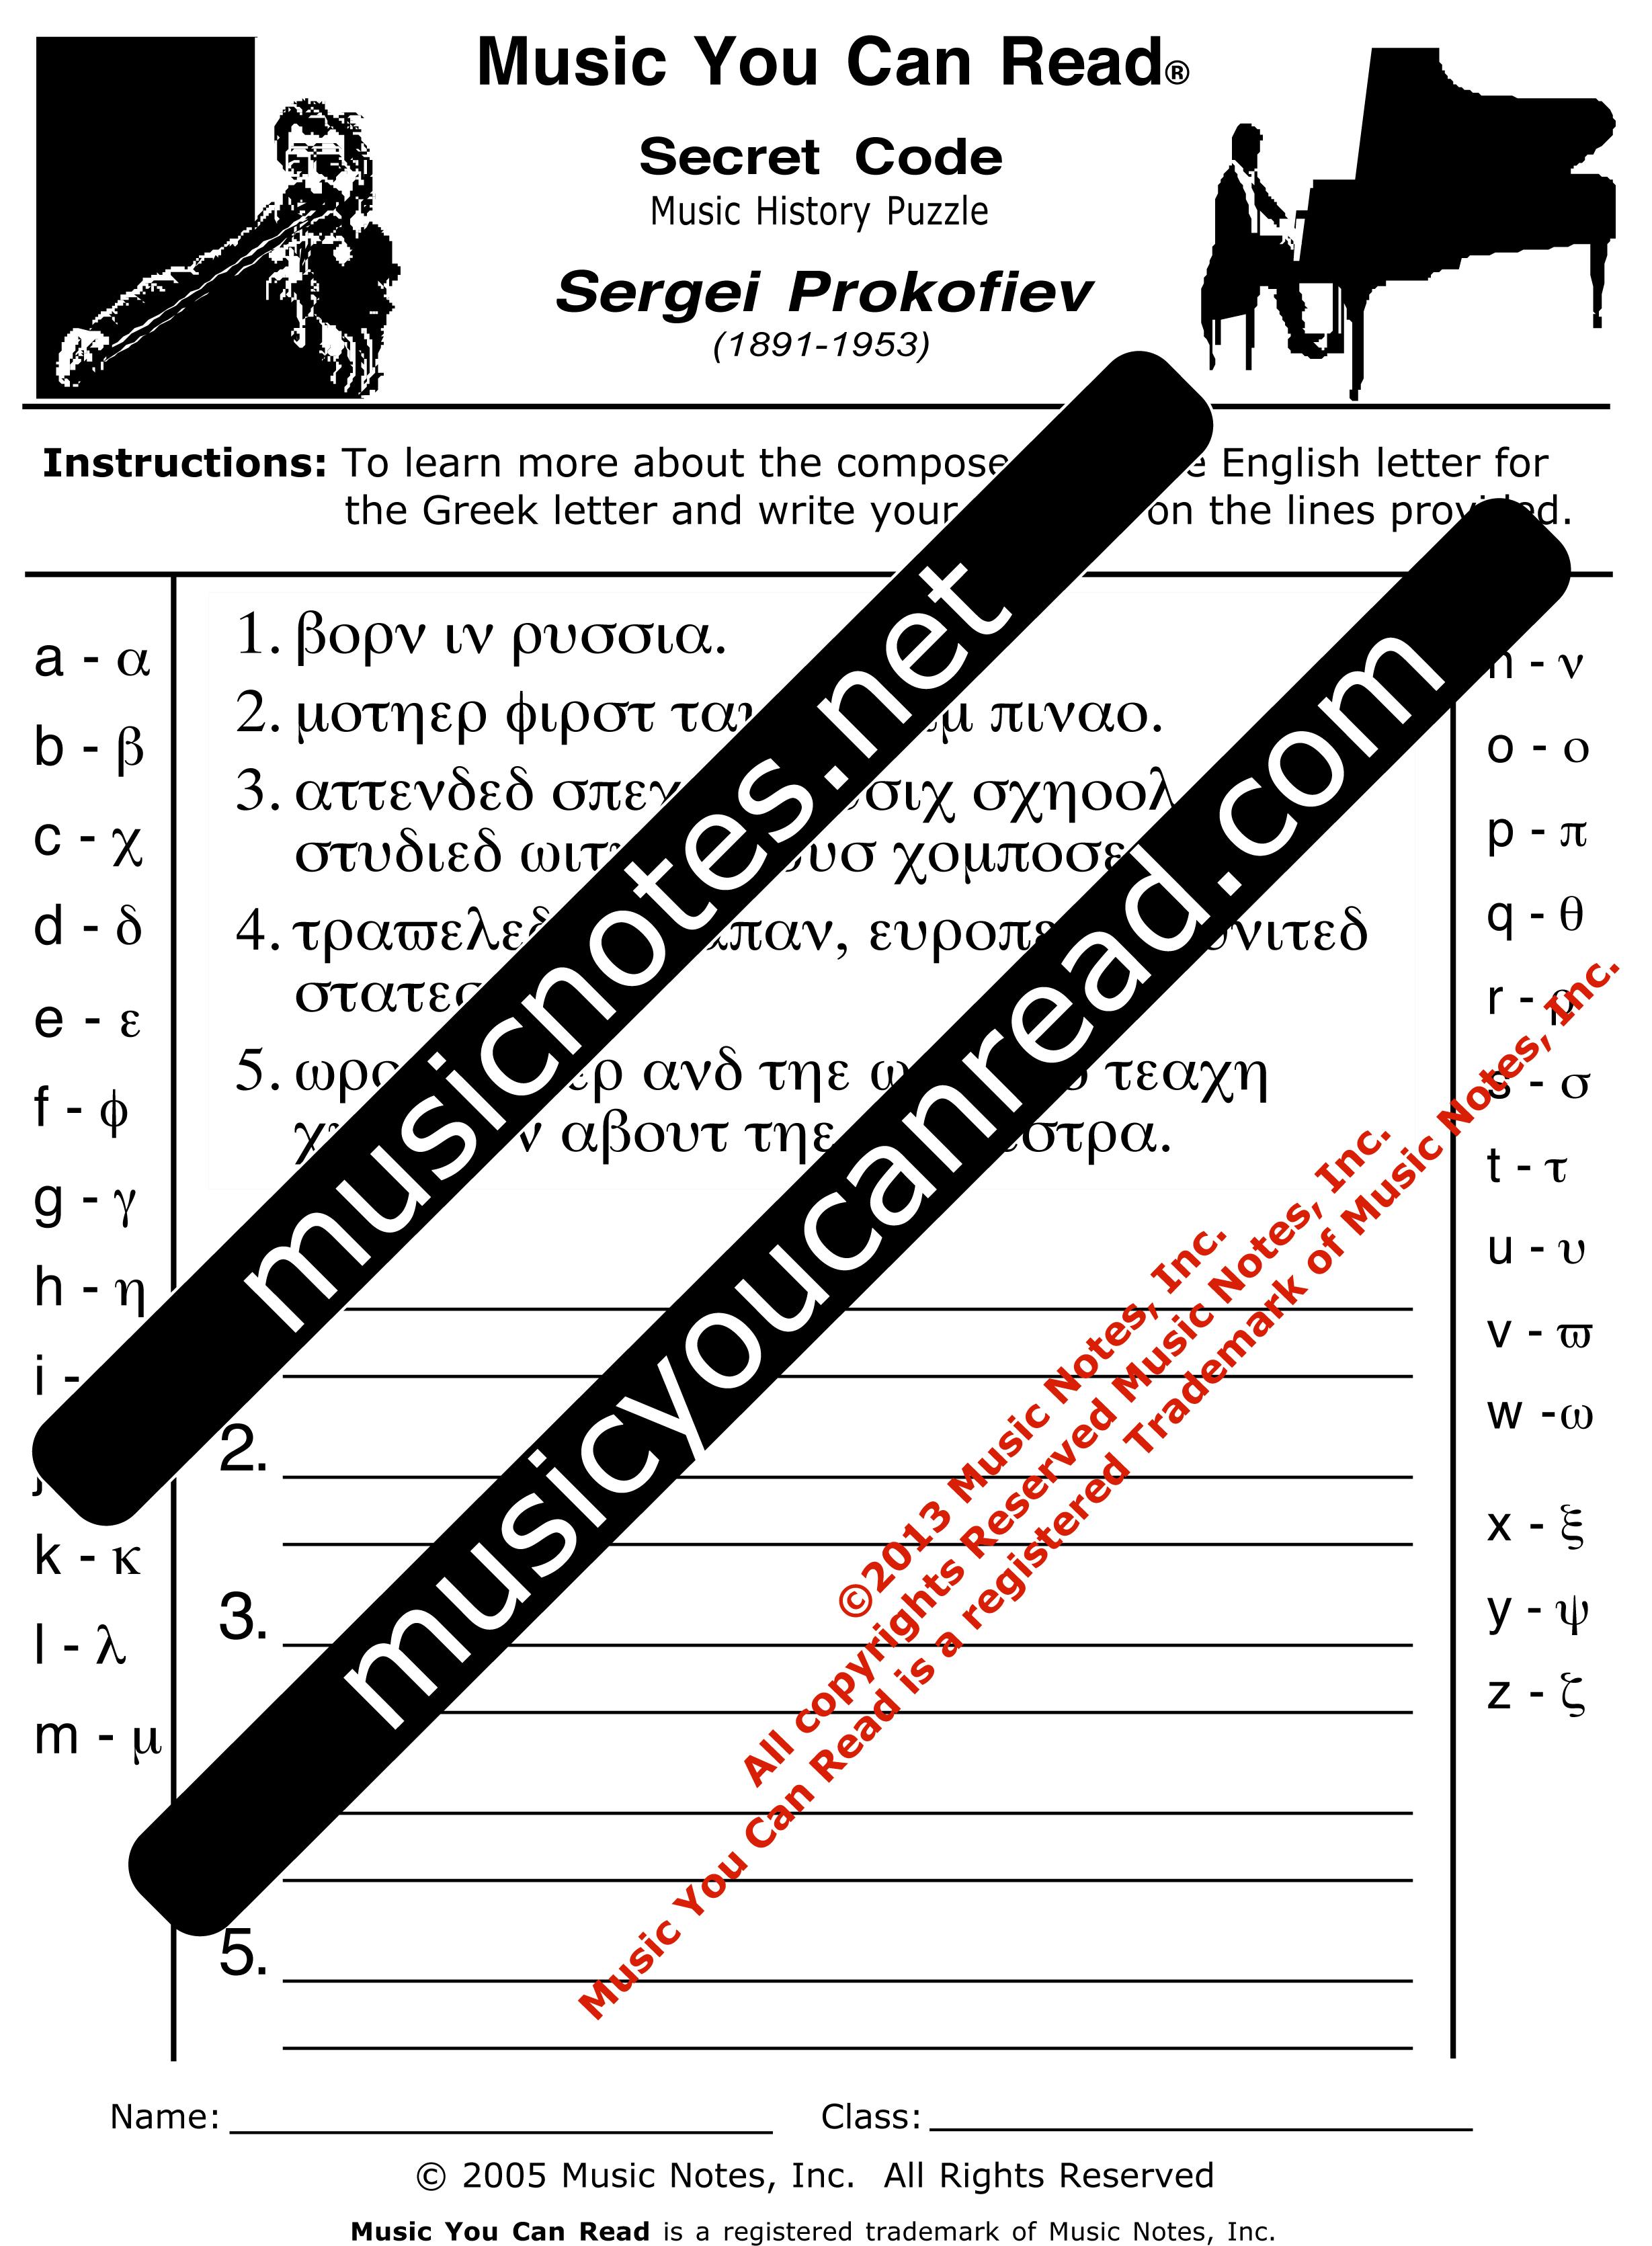 Secret Code – Sergei Prokofiev